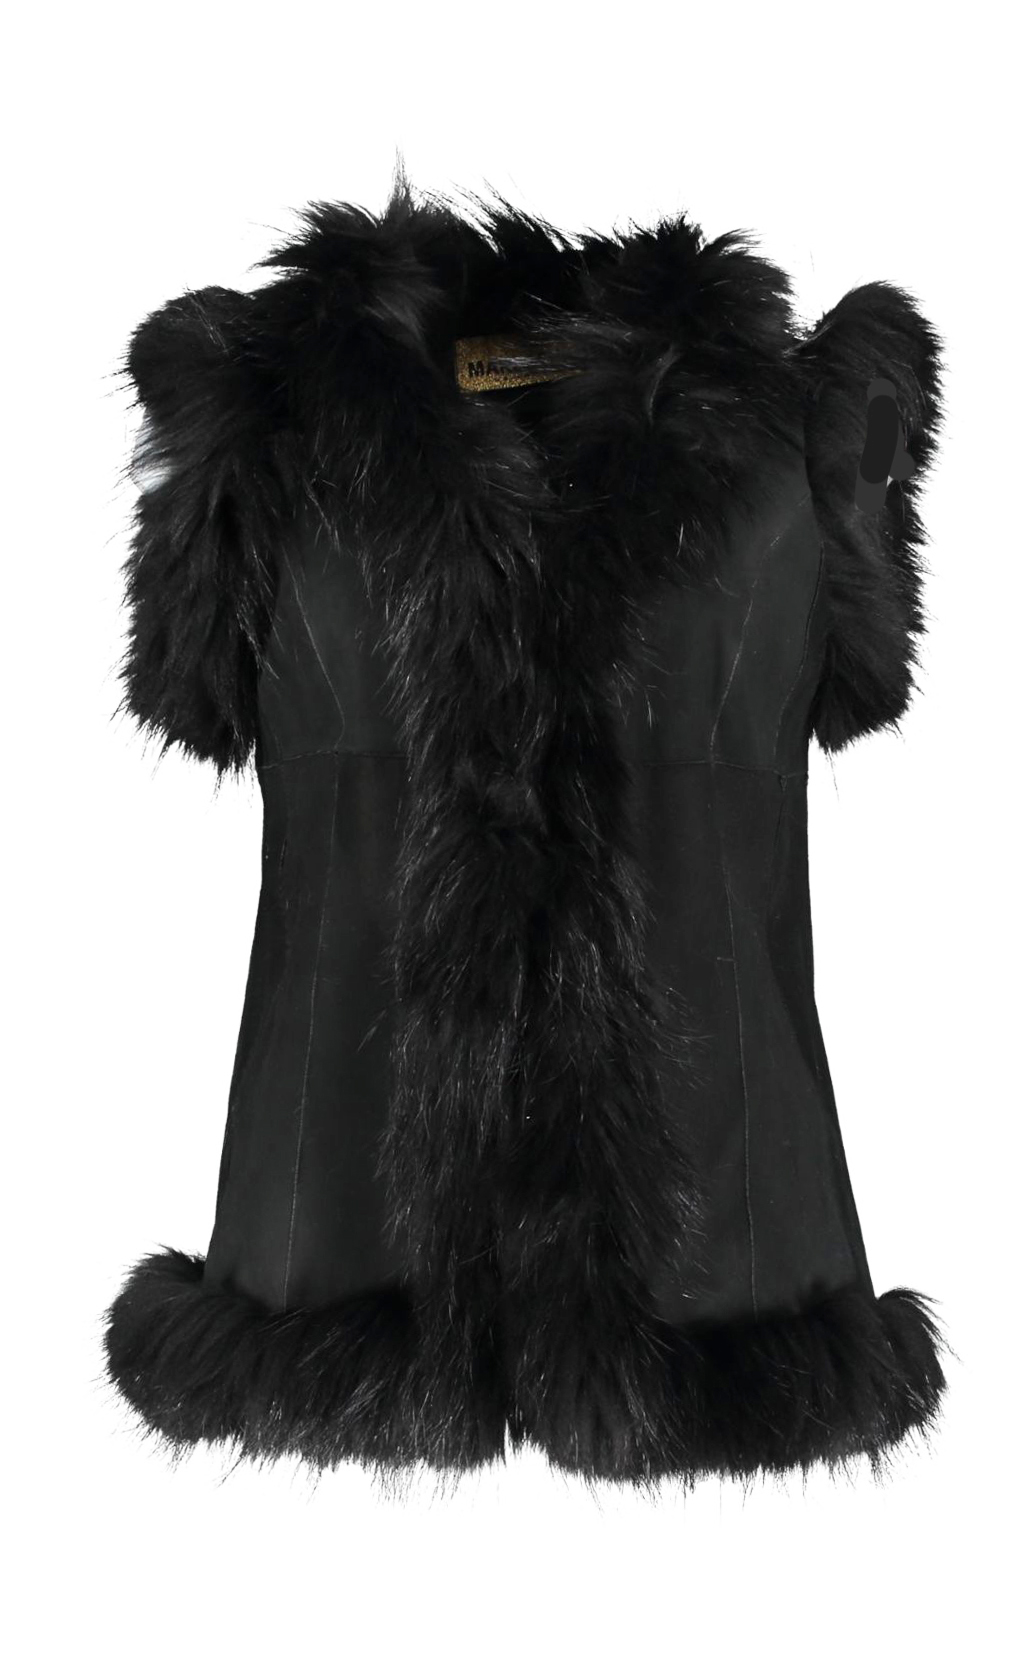 blk fur Vest _Front_JPG2000x2000Fixed